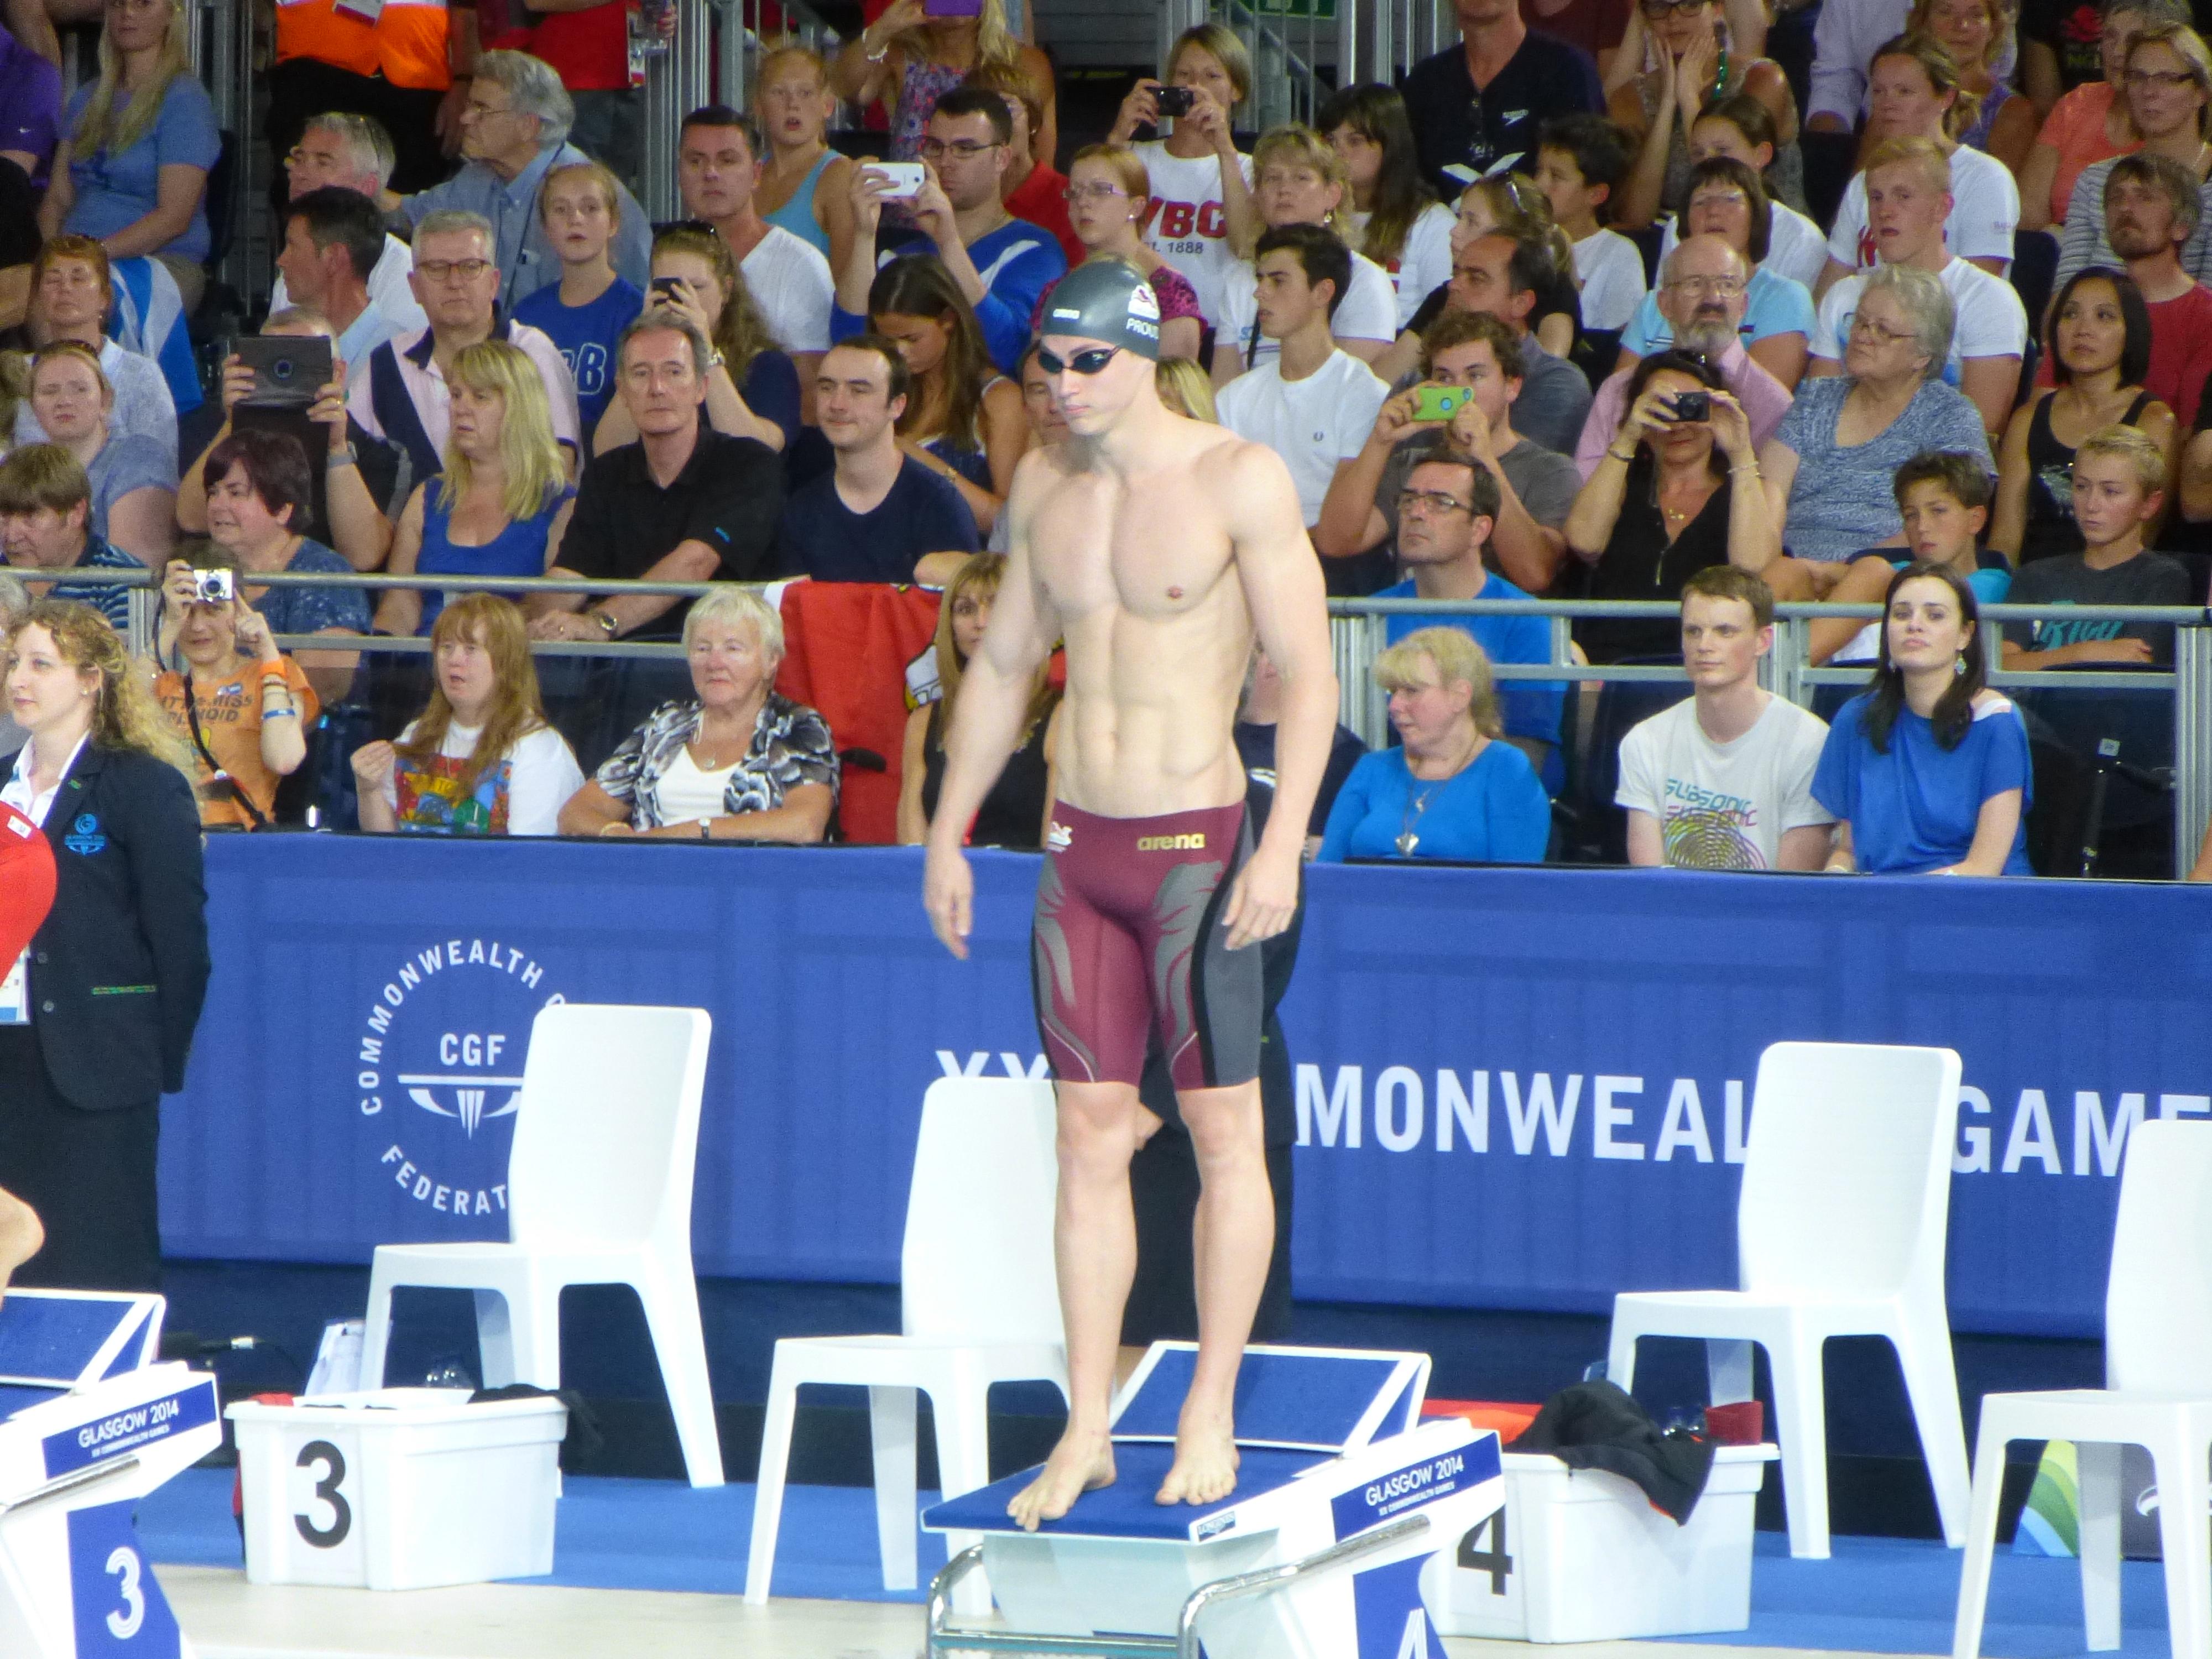 Mens 50m freestyle james magnussen dating 4